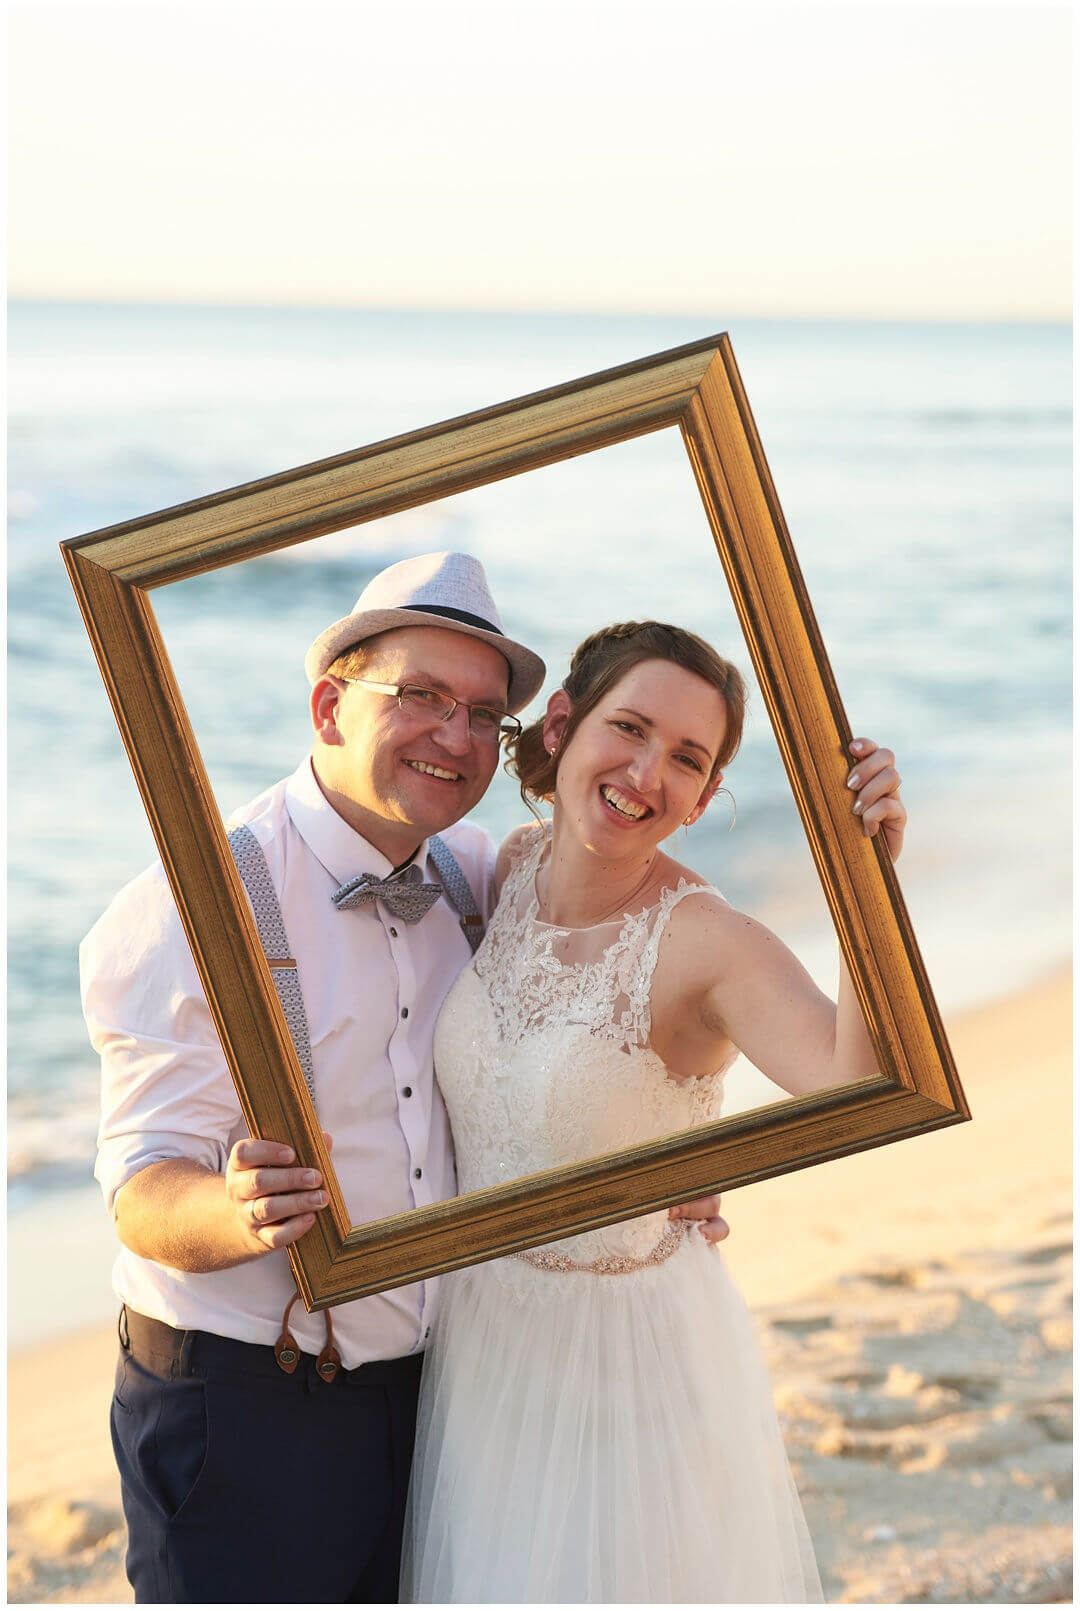 https://www.lovebirdceremonies.com.au/wp-content/uploads/2020/07/Isabelle-Marcus-1.jpg